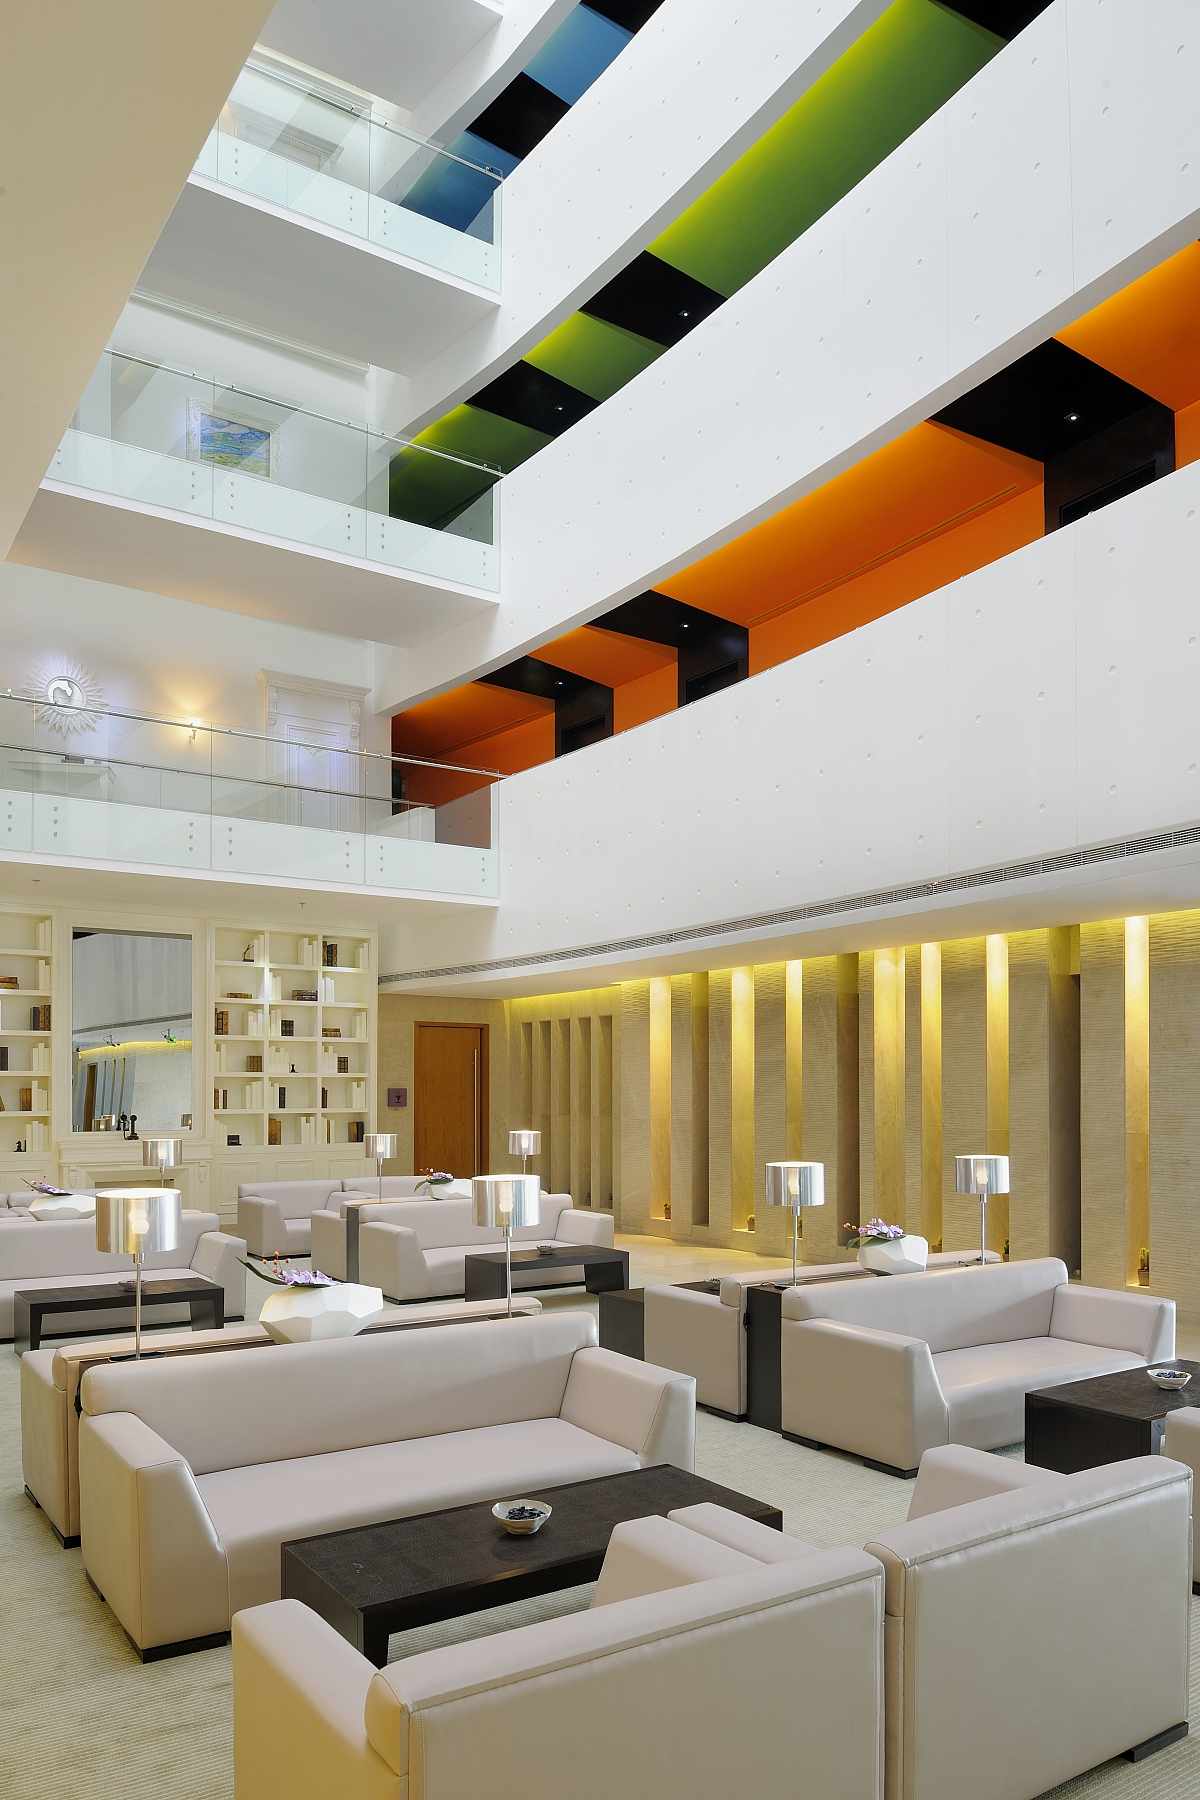 Hues boutique hotel dubai arabsk emir ty ck fischer for Hues hotel dubai